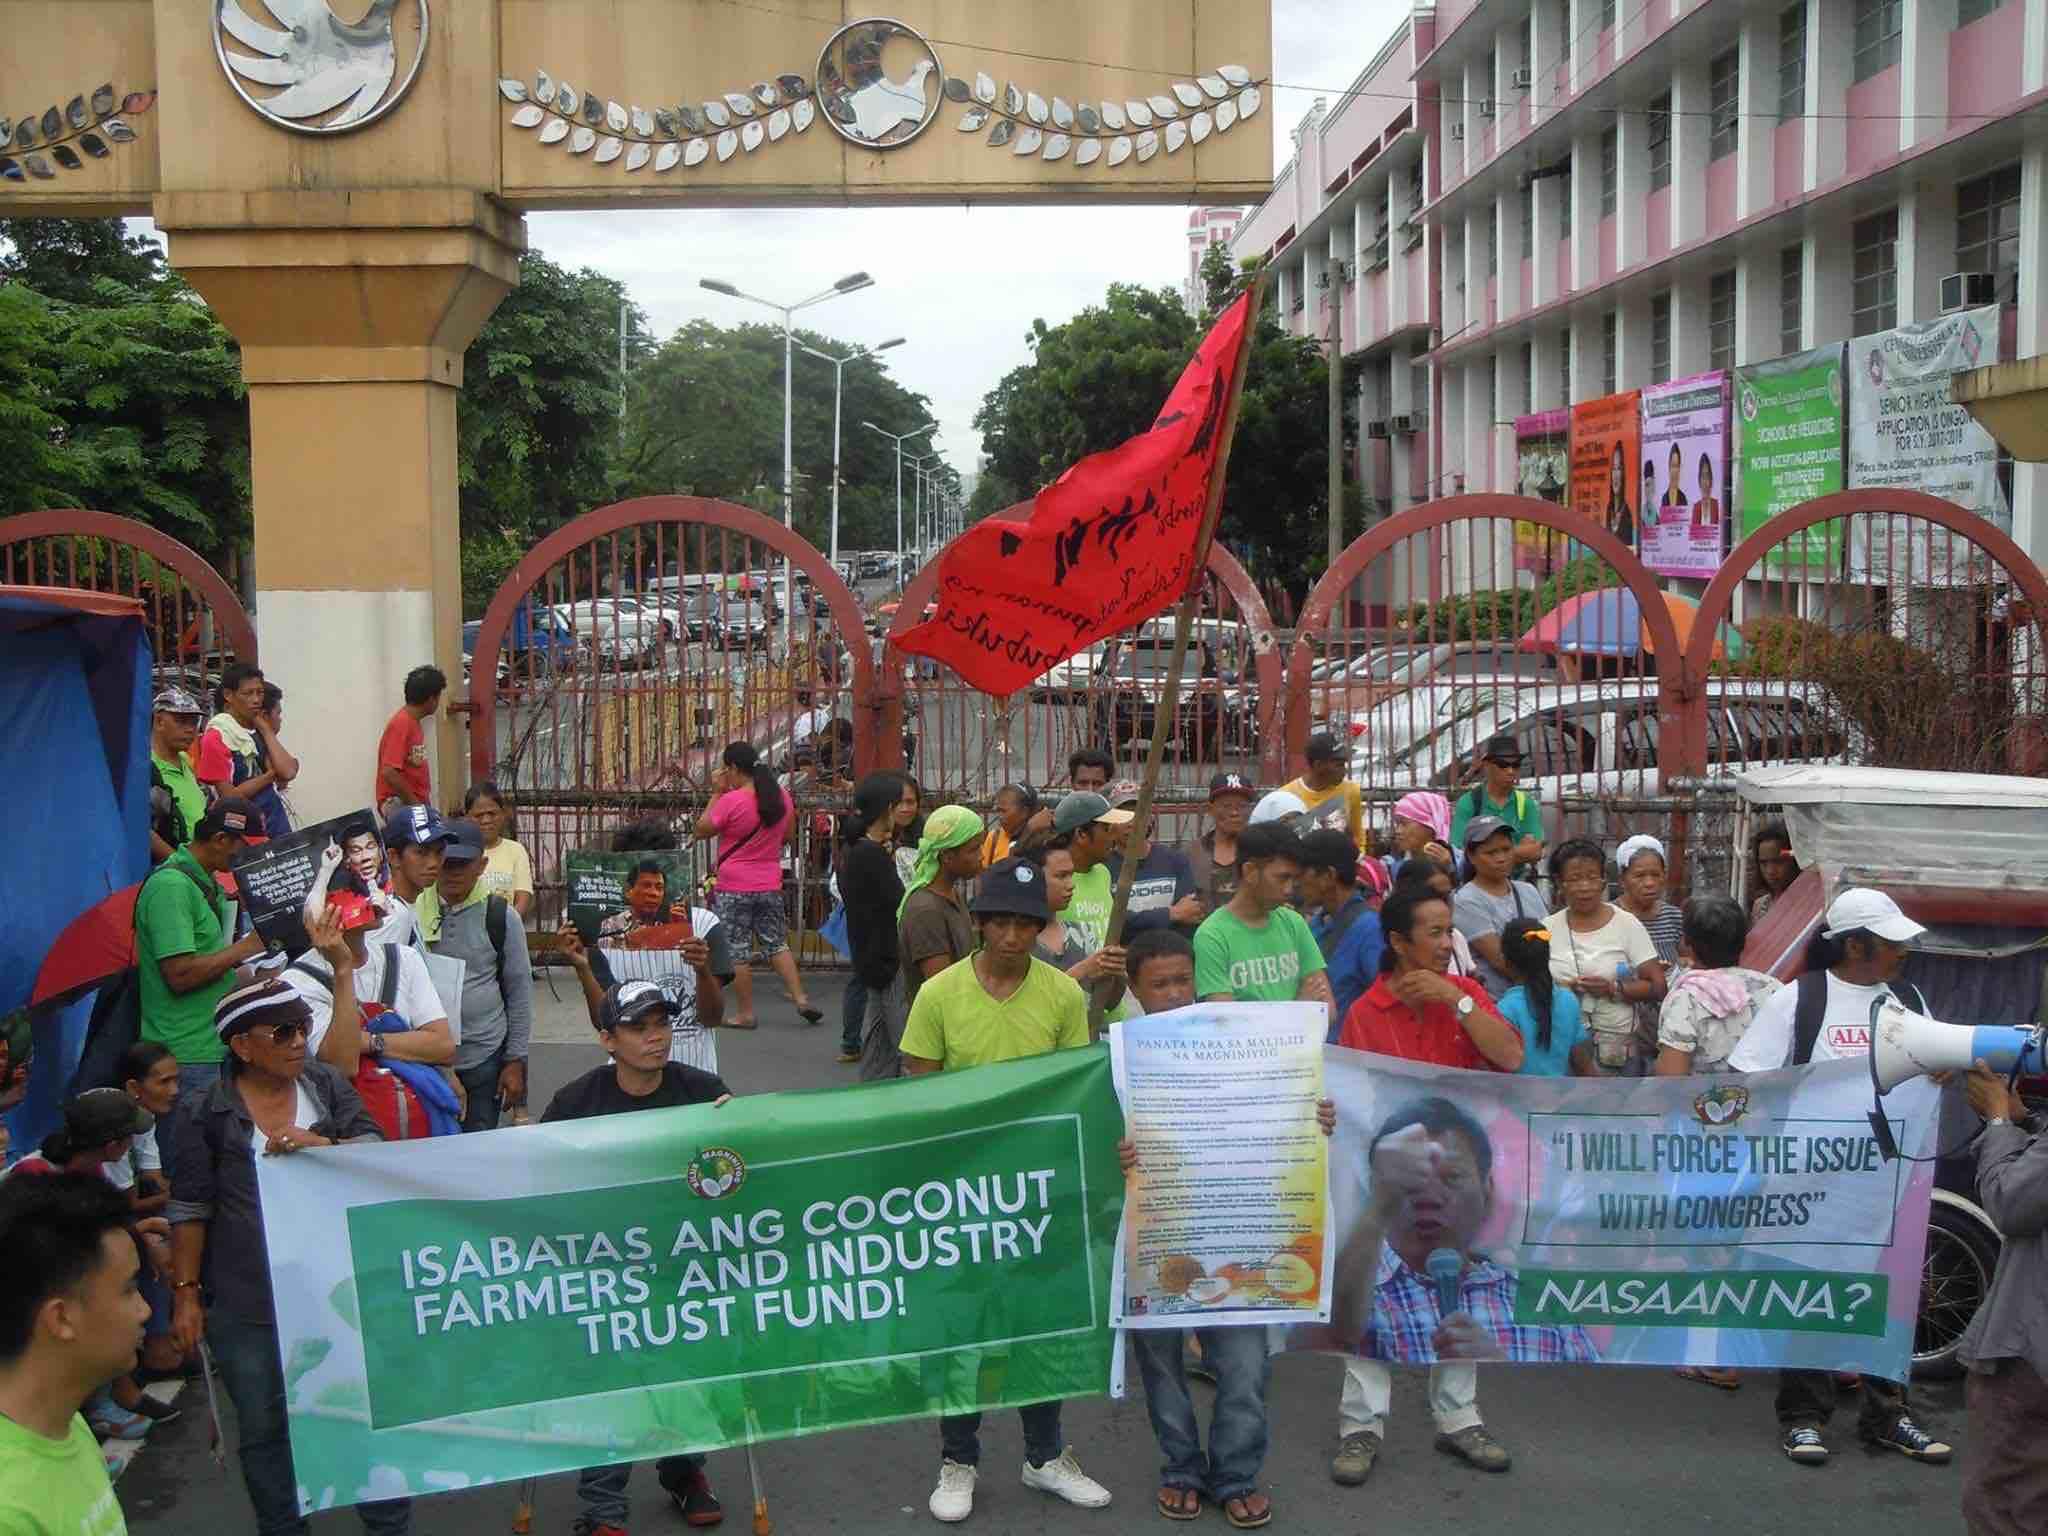 DEMAND. Farmers press Duterte to keep his campaign promise. Photo from Kilus Magniniyog